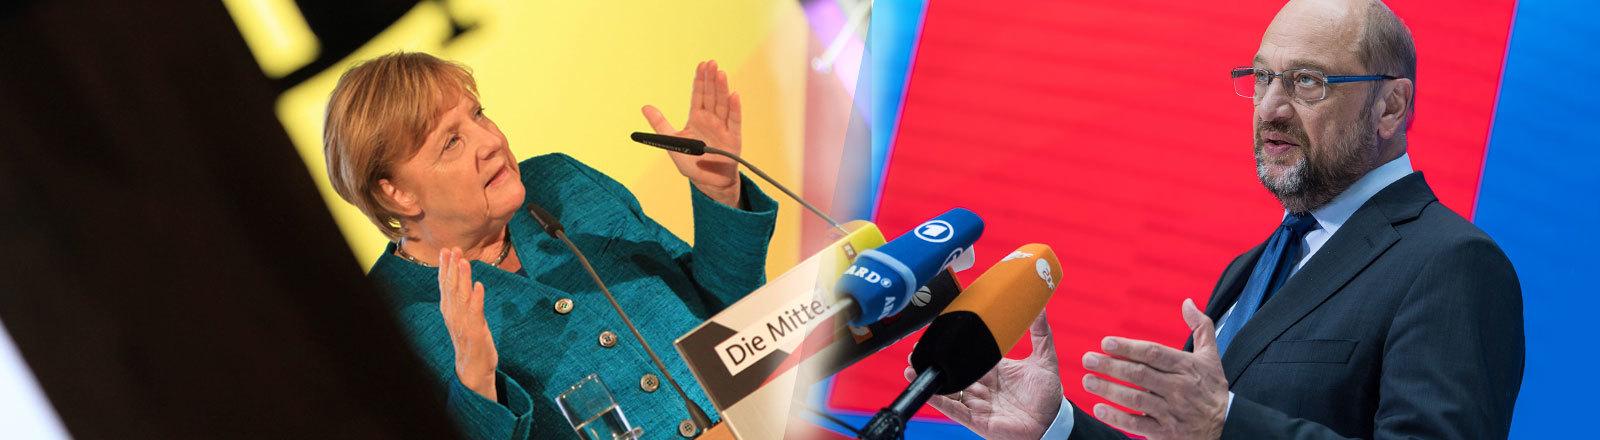 Angela Merkel Martin Schulz Kanzlerkandidaten